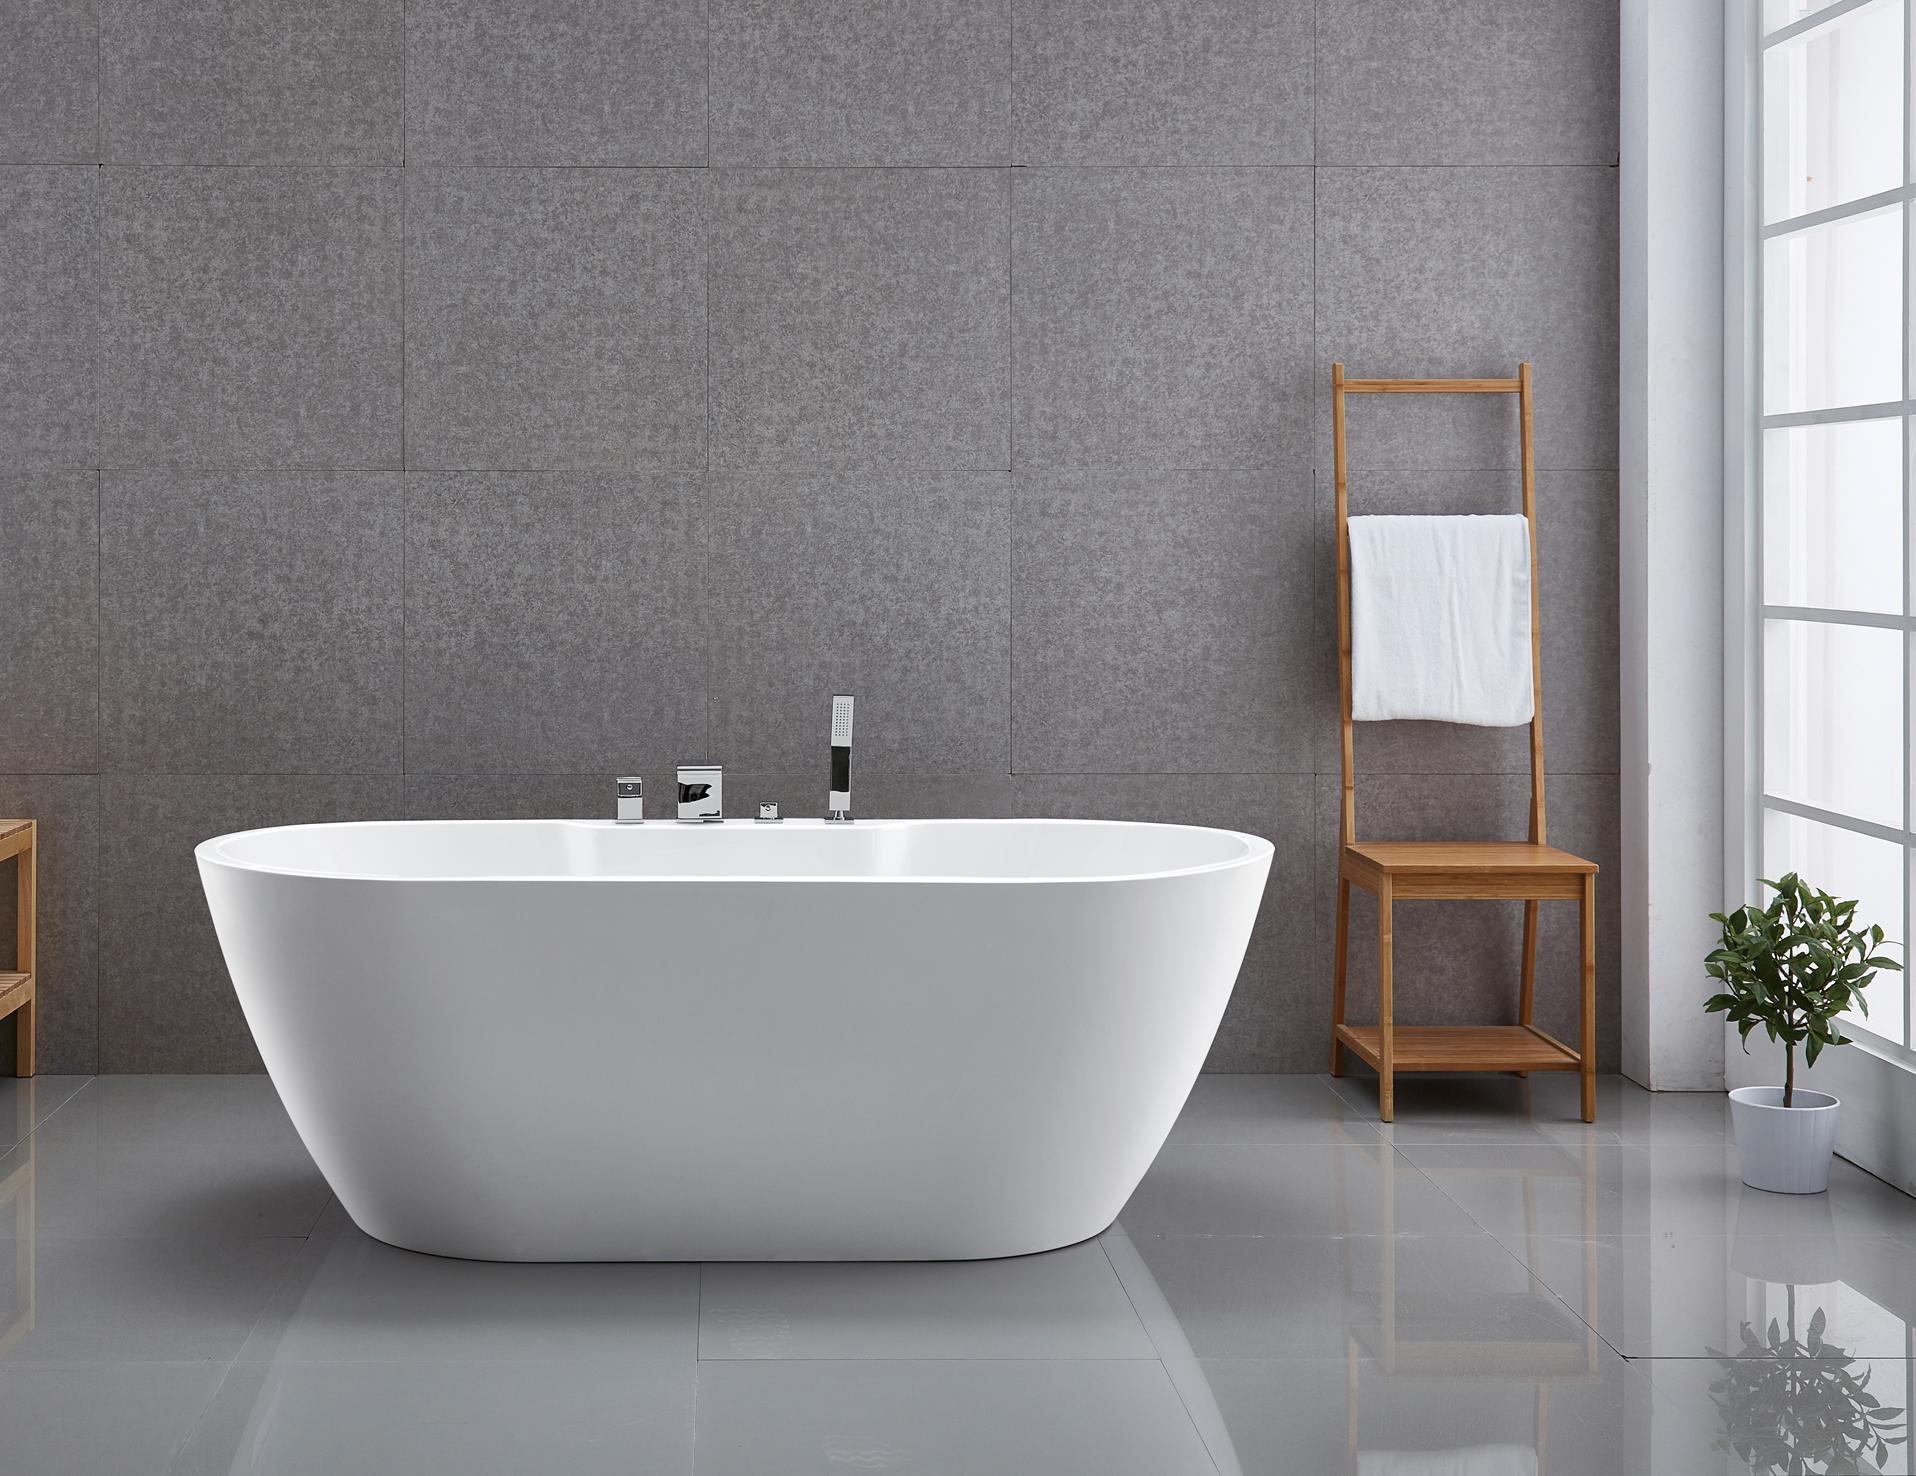 Vasca da bagno indipendente standbadewanne acrilico jazz - Materiale vasca da bagno ...